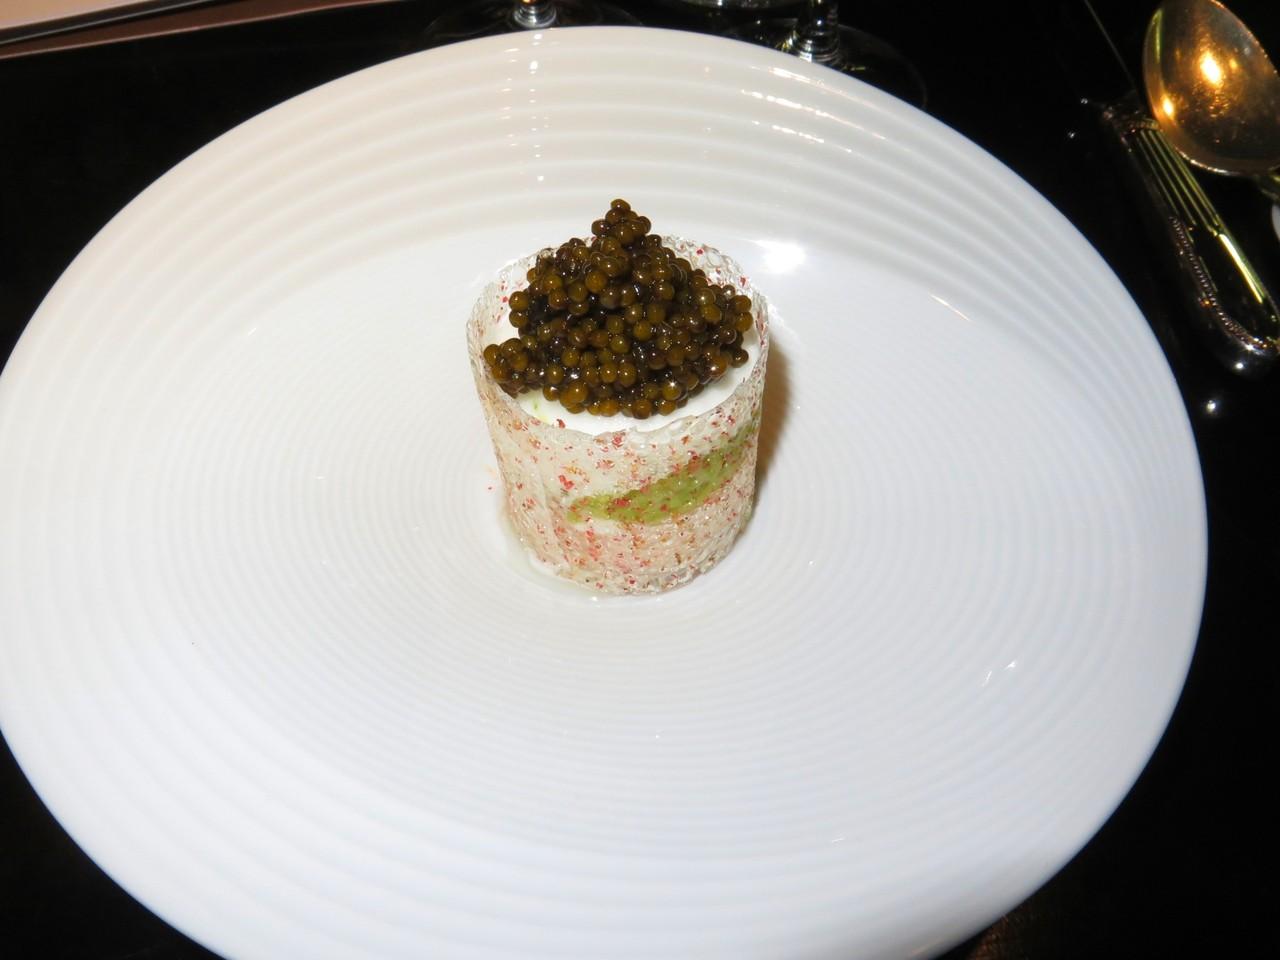 Caranguejo, Pera-Abacate, Caramelo, Pimenta Rosa & Bergamota